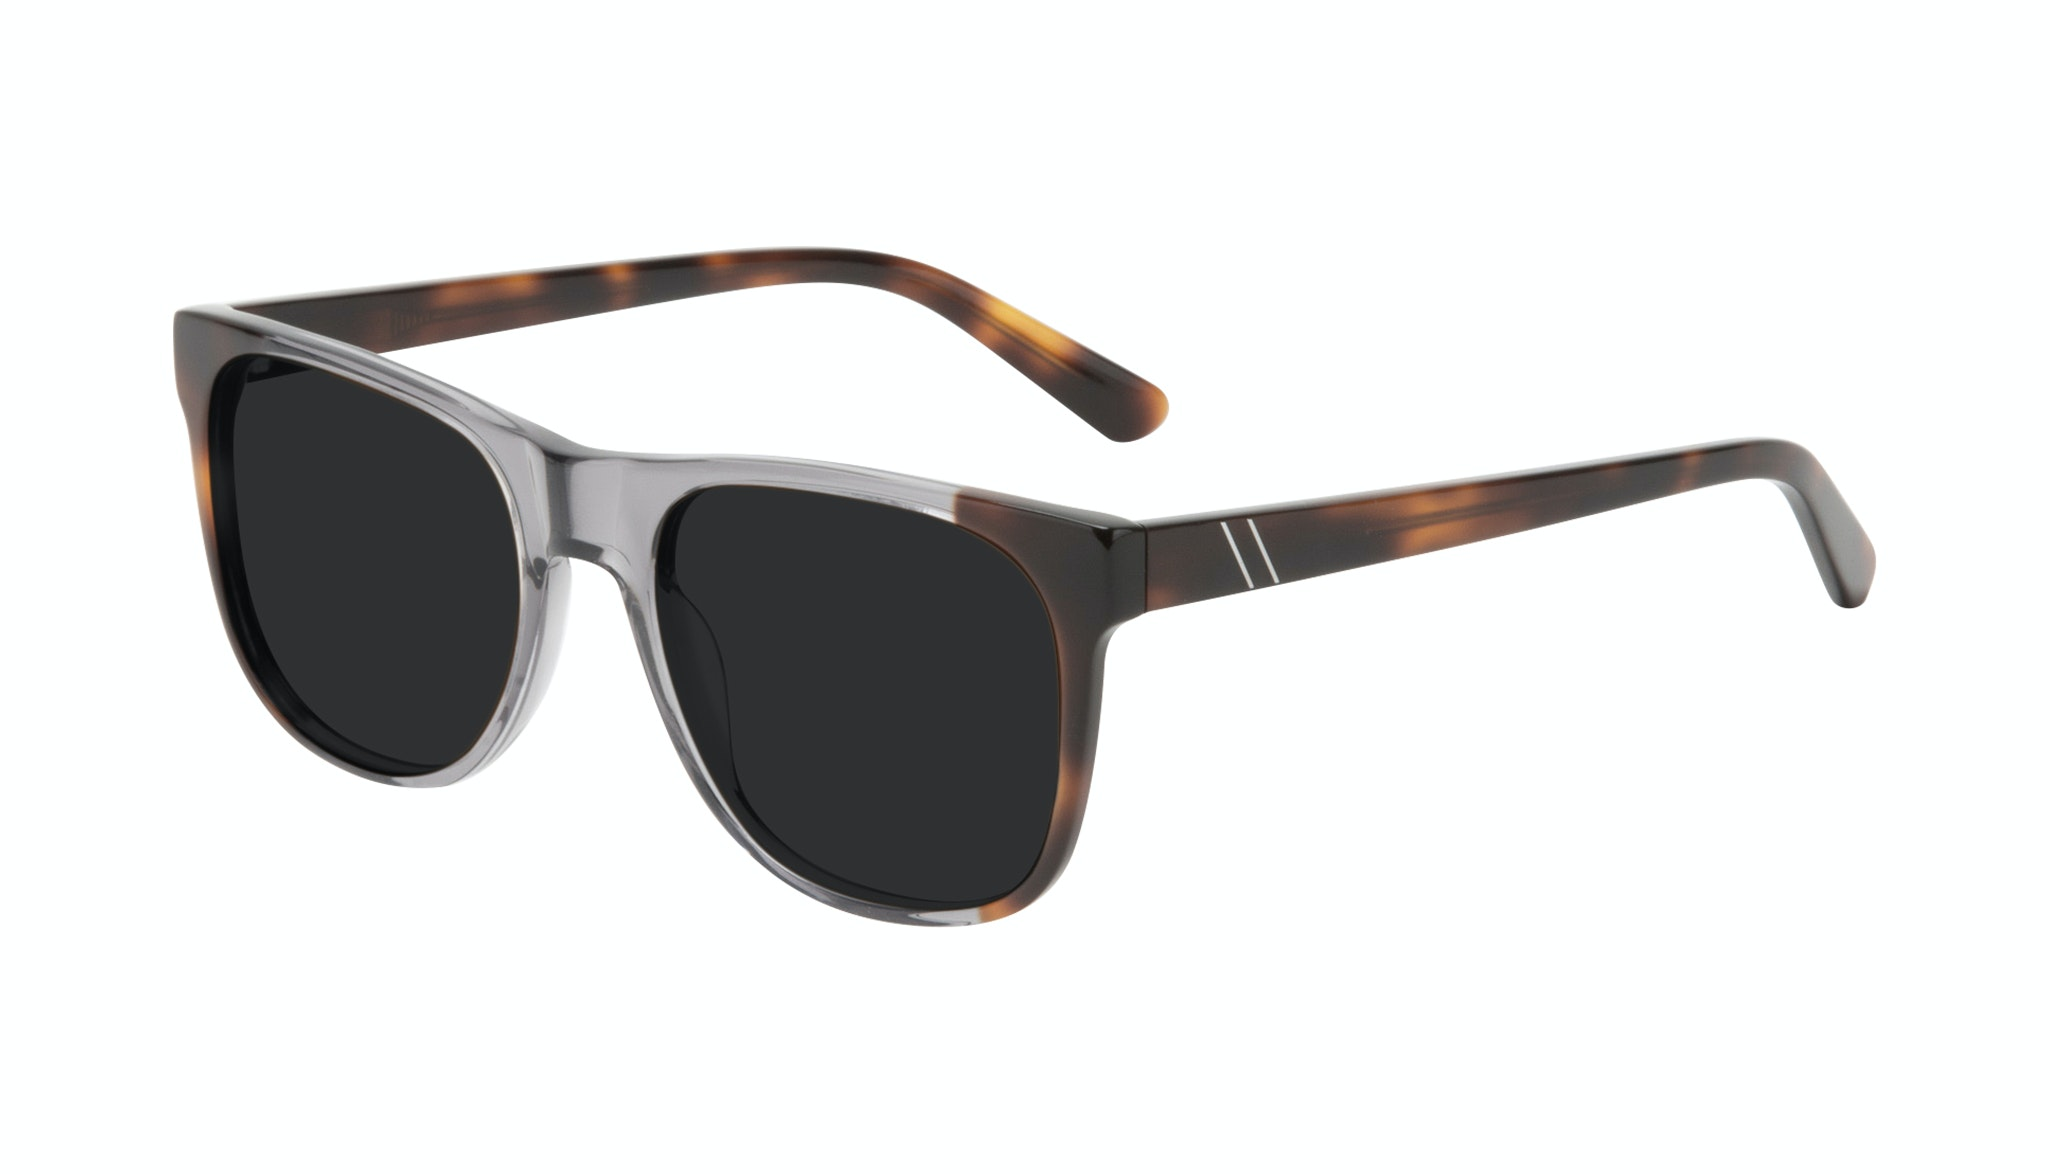 Affordable Fashion Glasses Square Sunglasses Men Make Smokey Tort Tilt